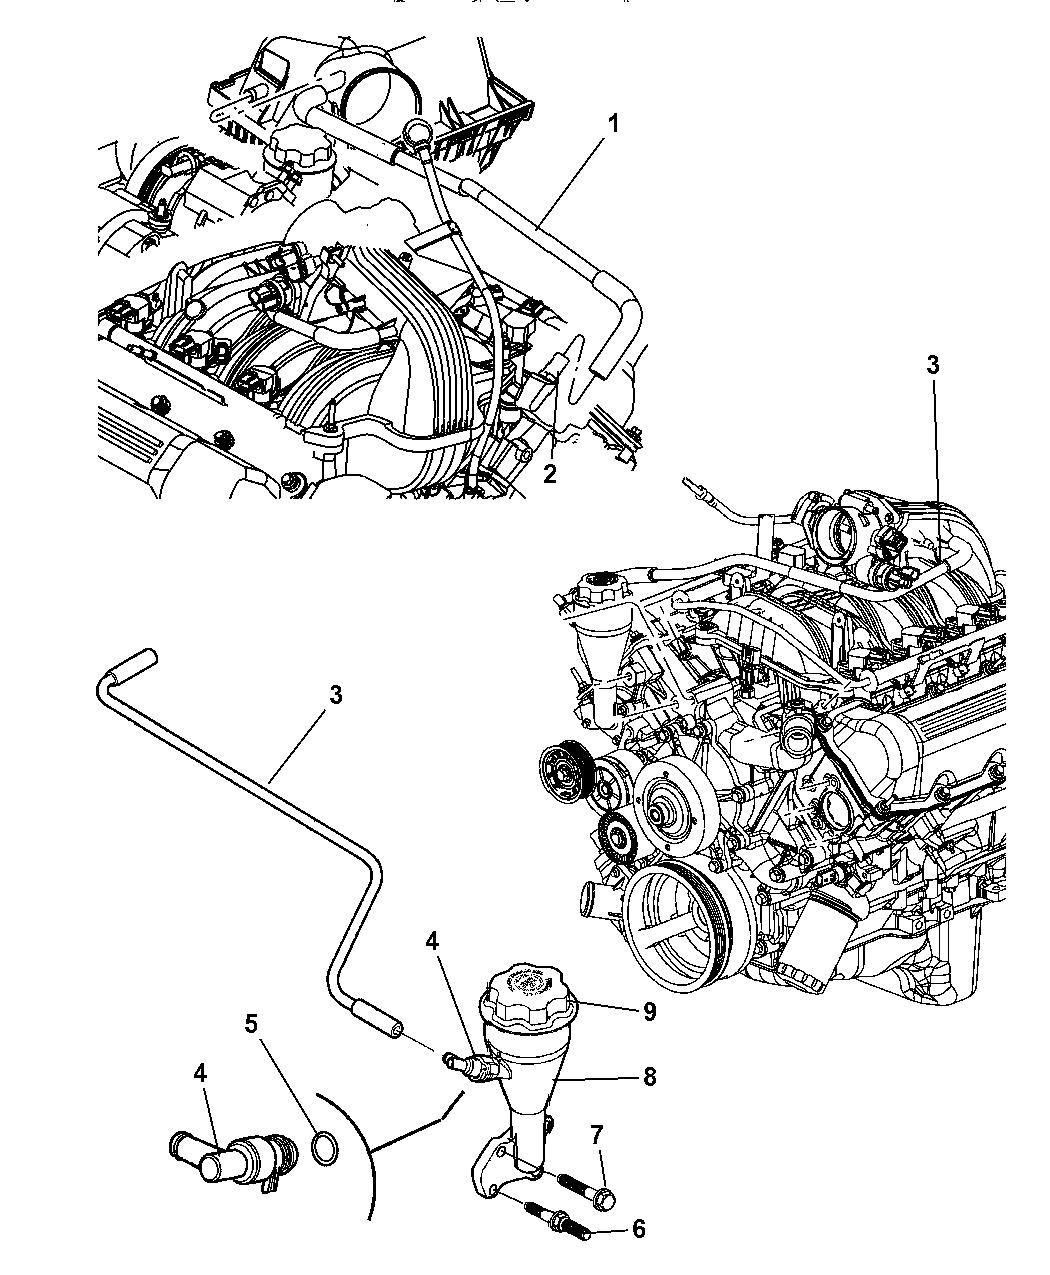 2007 Dodge Nitro Crankcase Ventilation - Thumbnail 1